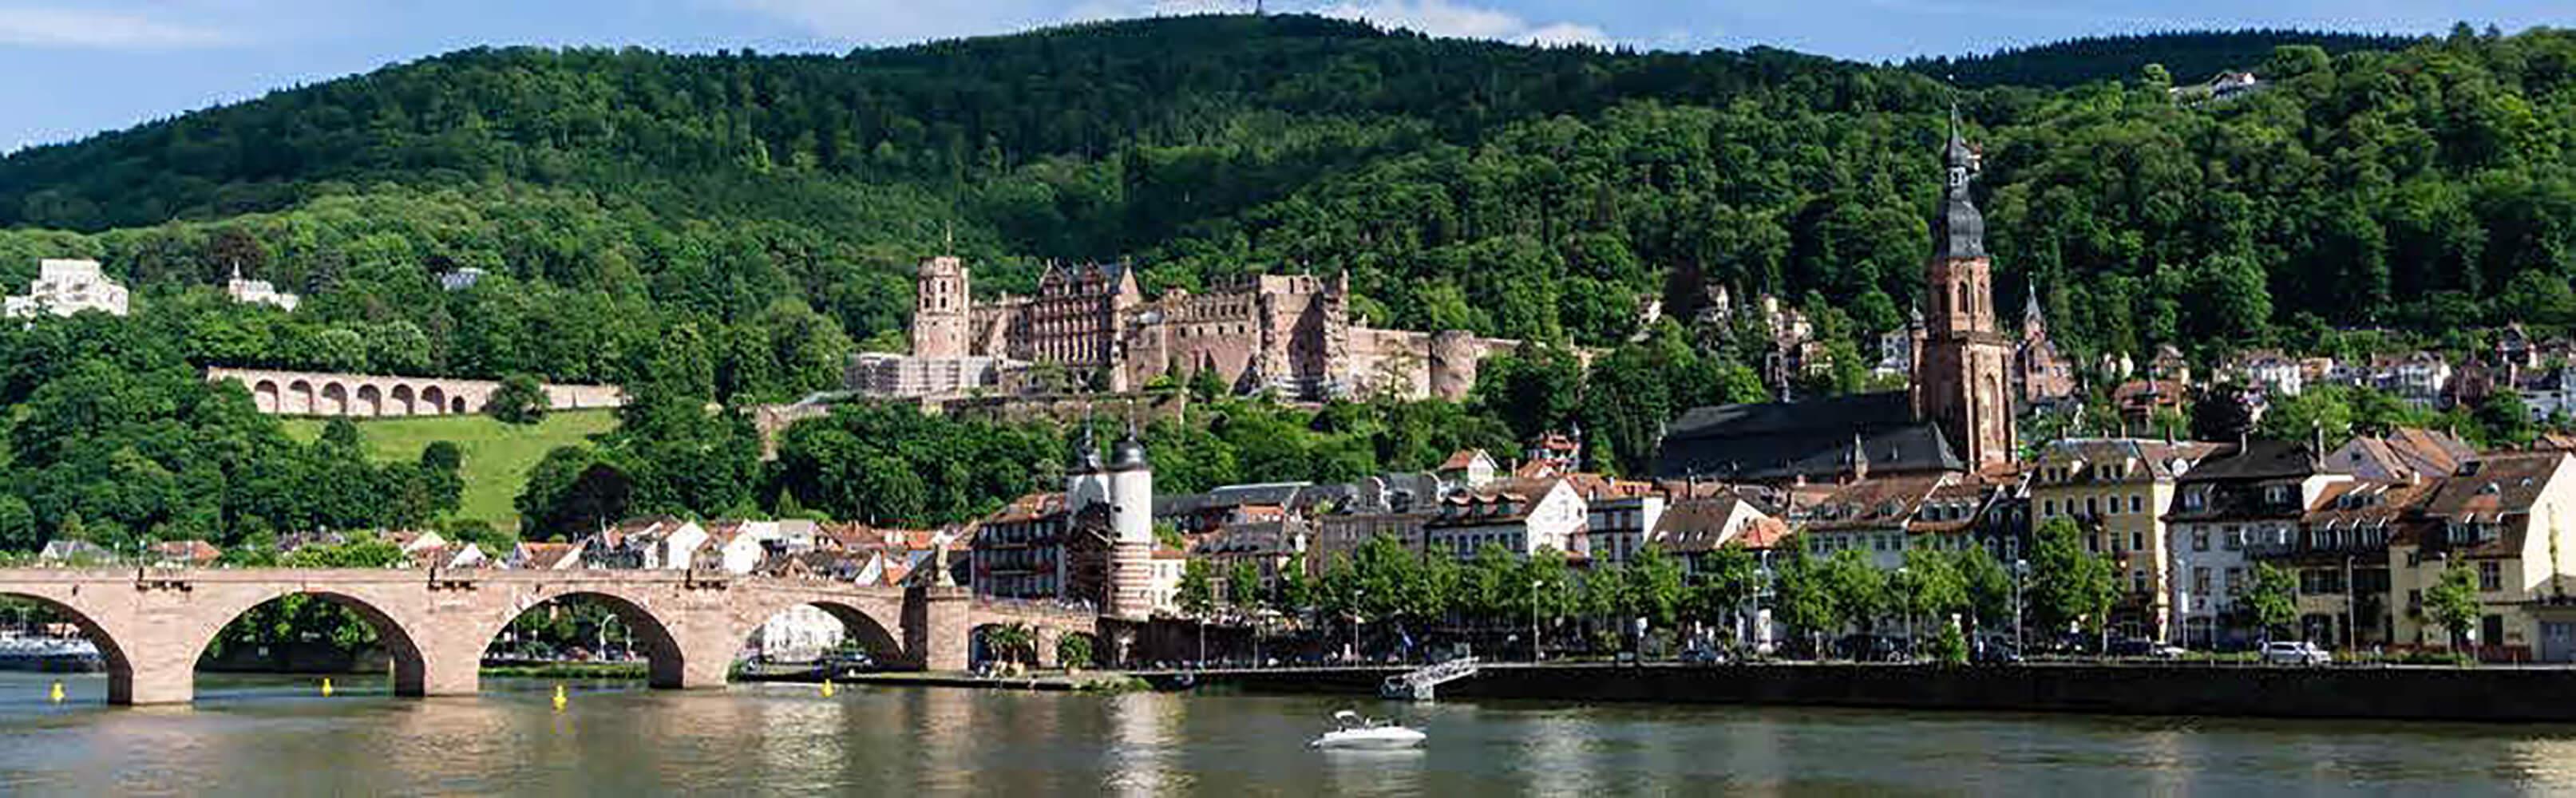 Heidelberg und Schloss Heidelberg 1